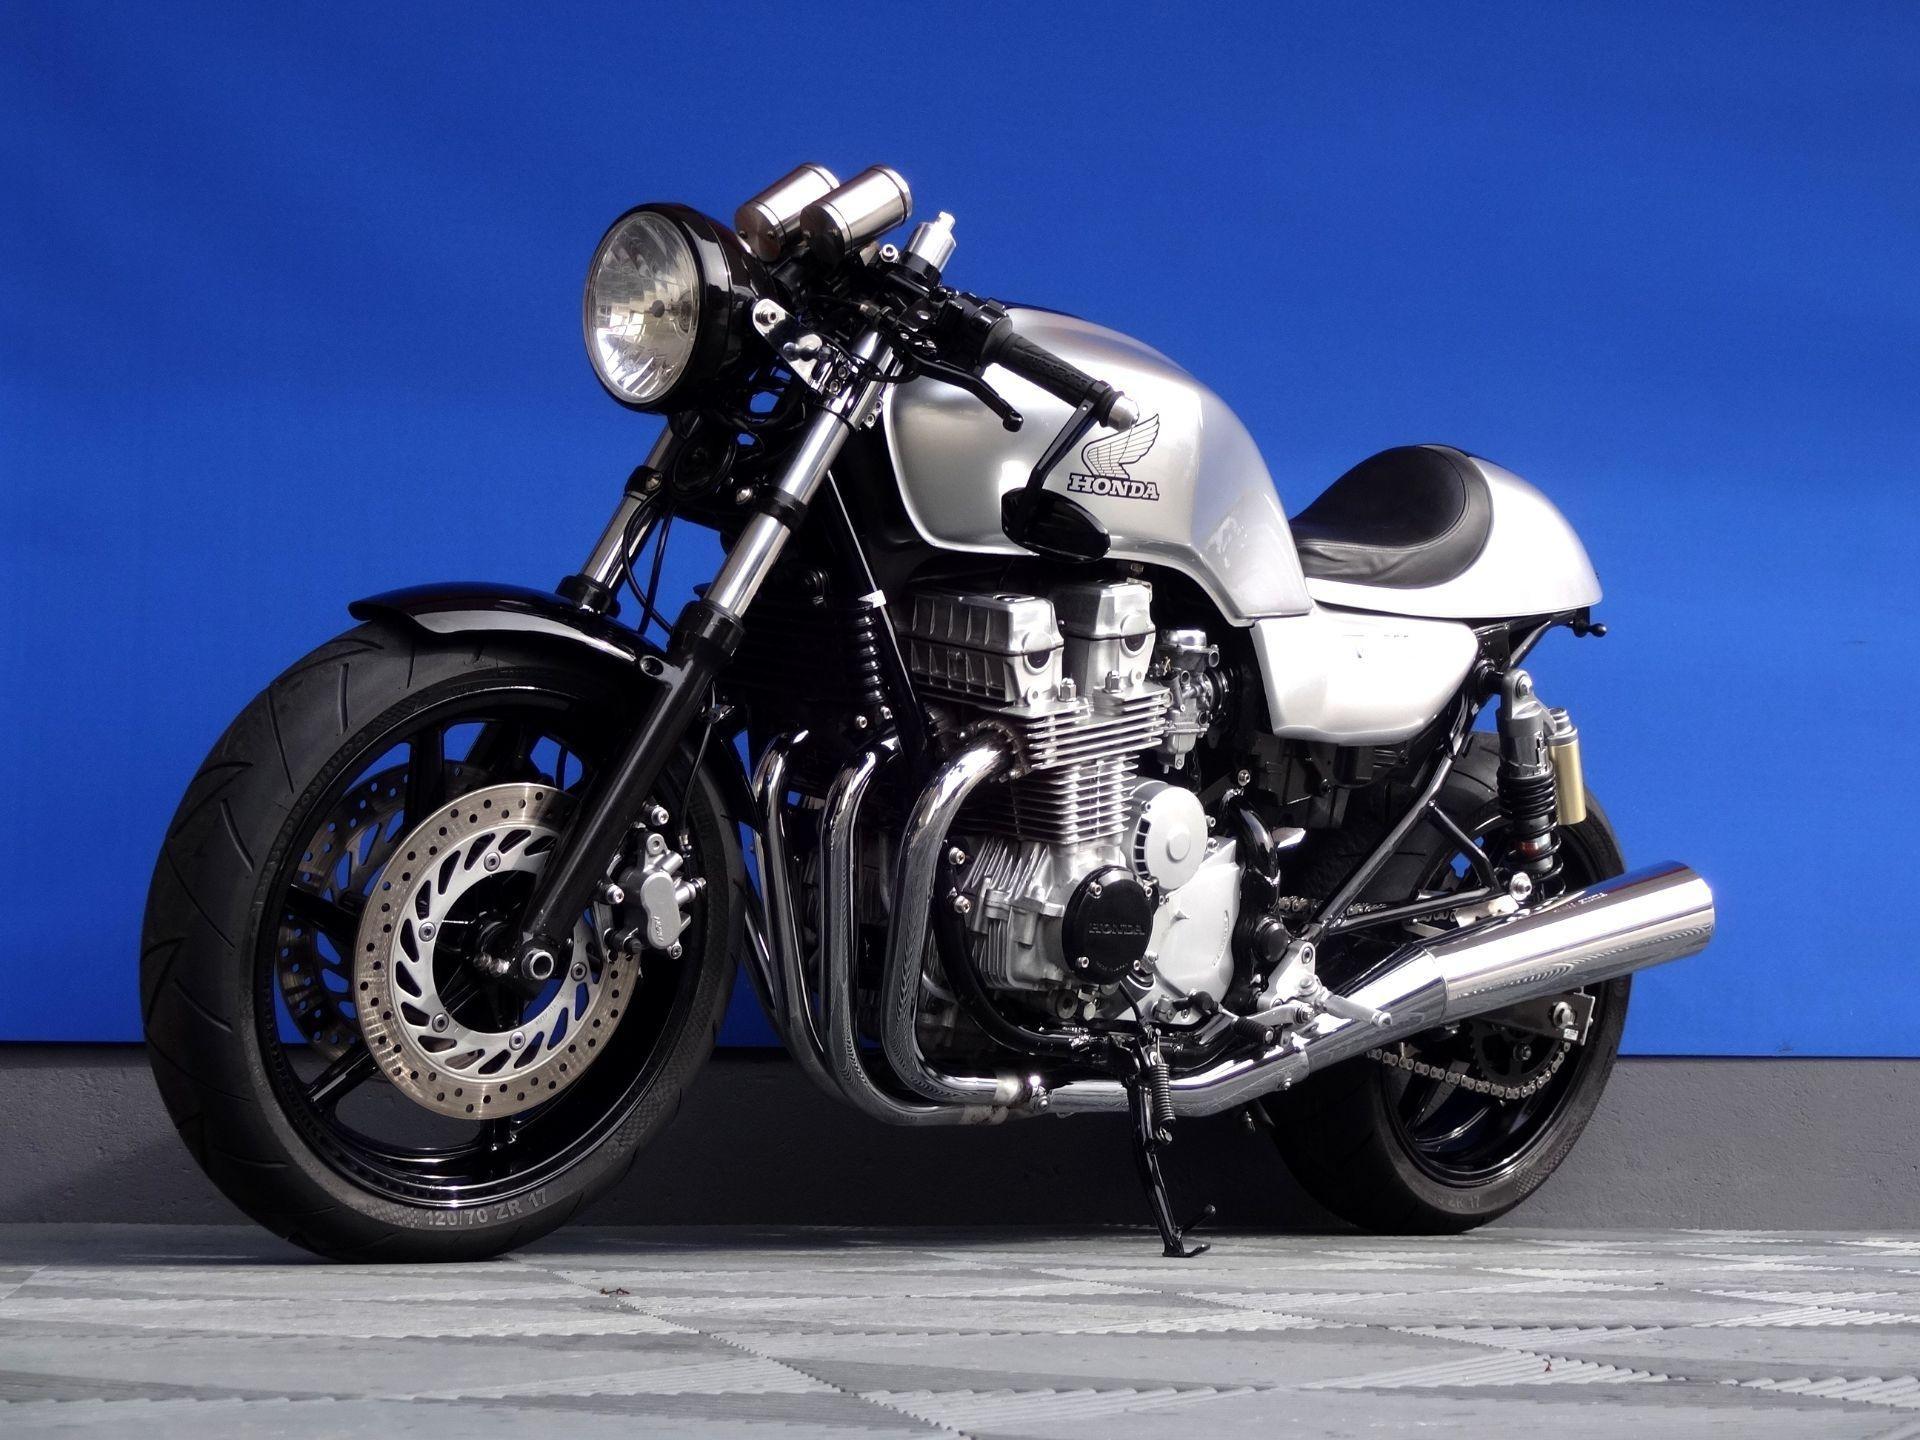 honda cb 750 f2 seven fifty cafe racer vogel motorbikes sch pfheim pre owned. Black Bedroom Furniture Sets. Home Design Ideas